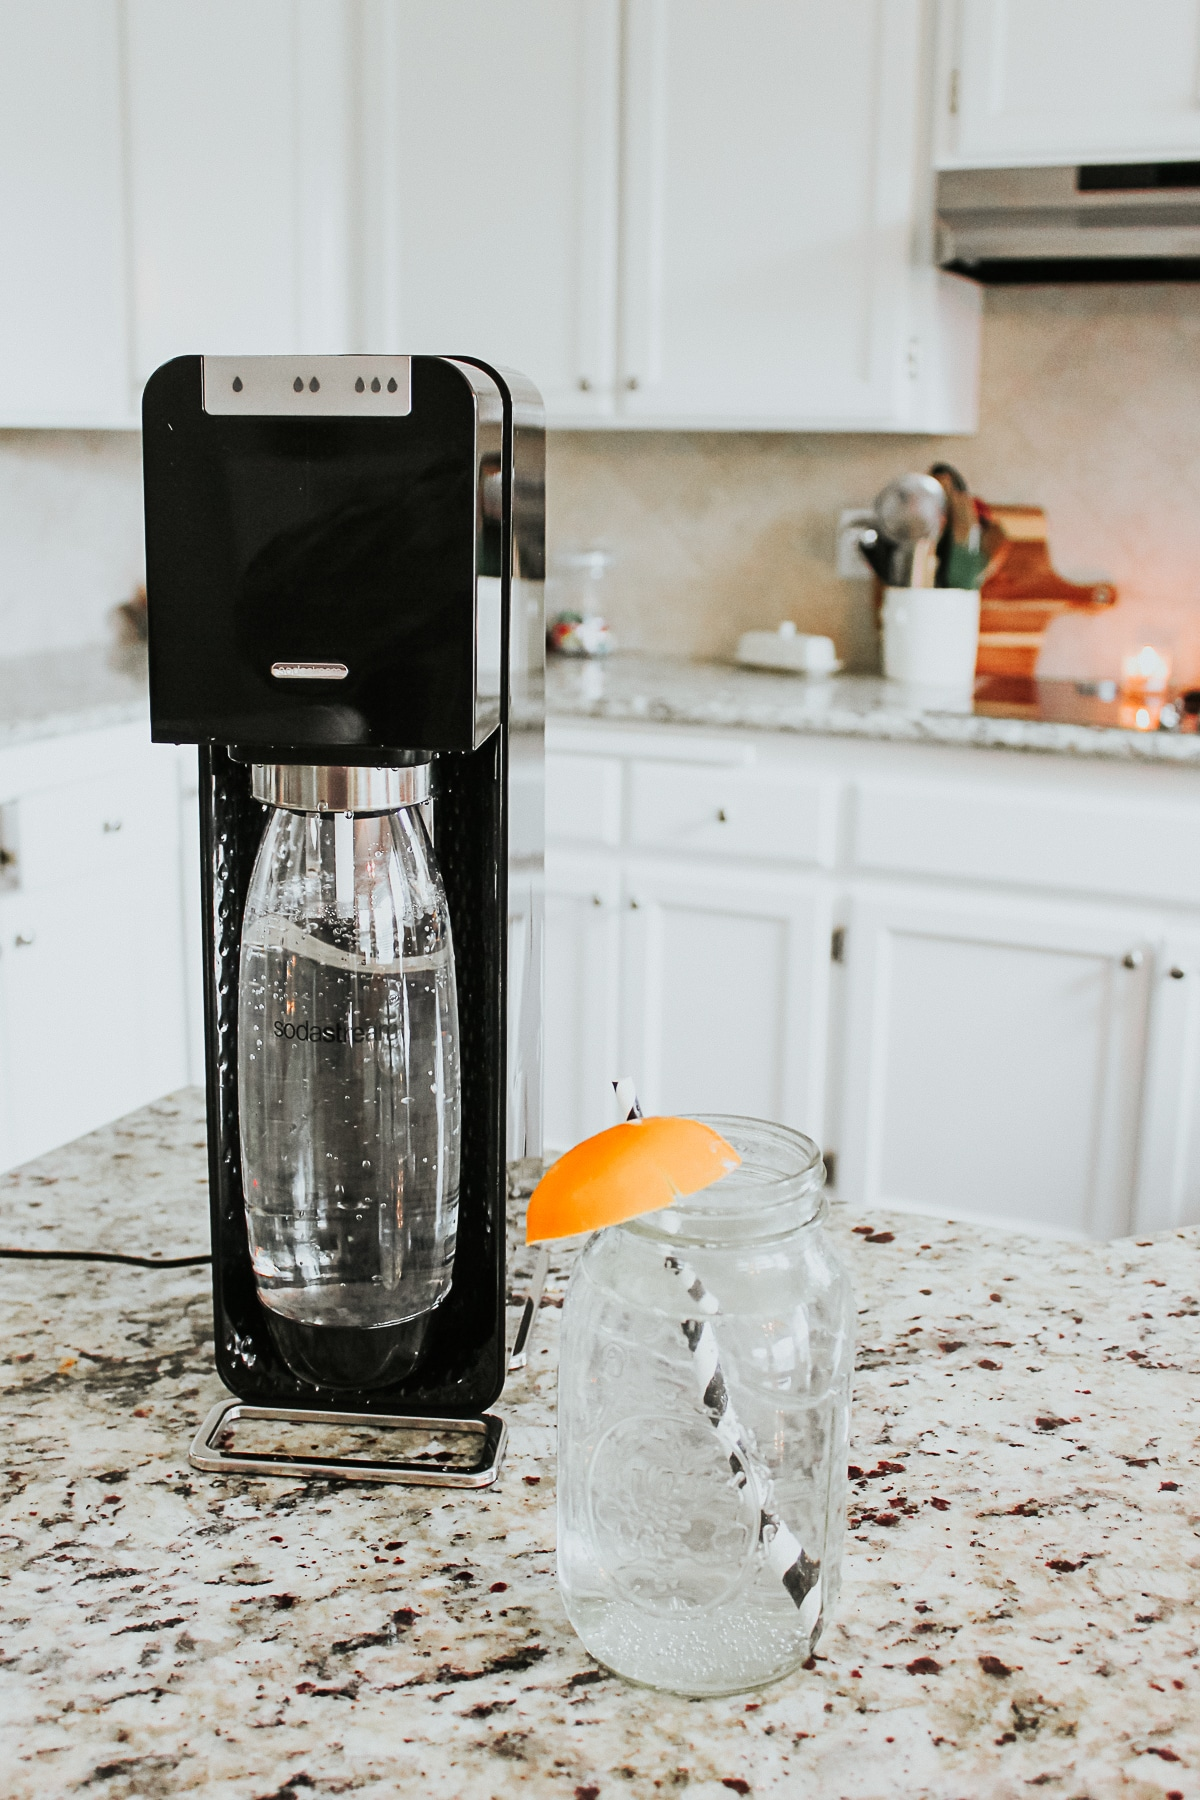 SodaStream Power Machine, with Lemon sparkling water - Sodastream Power Review